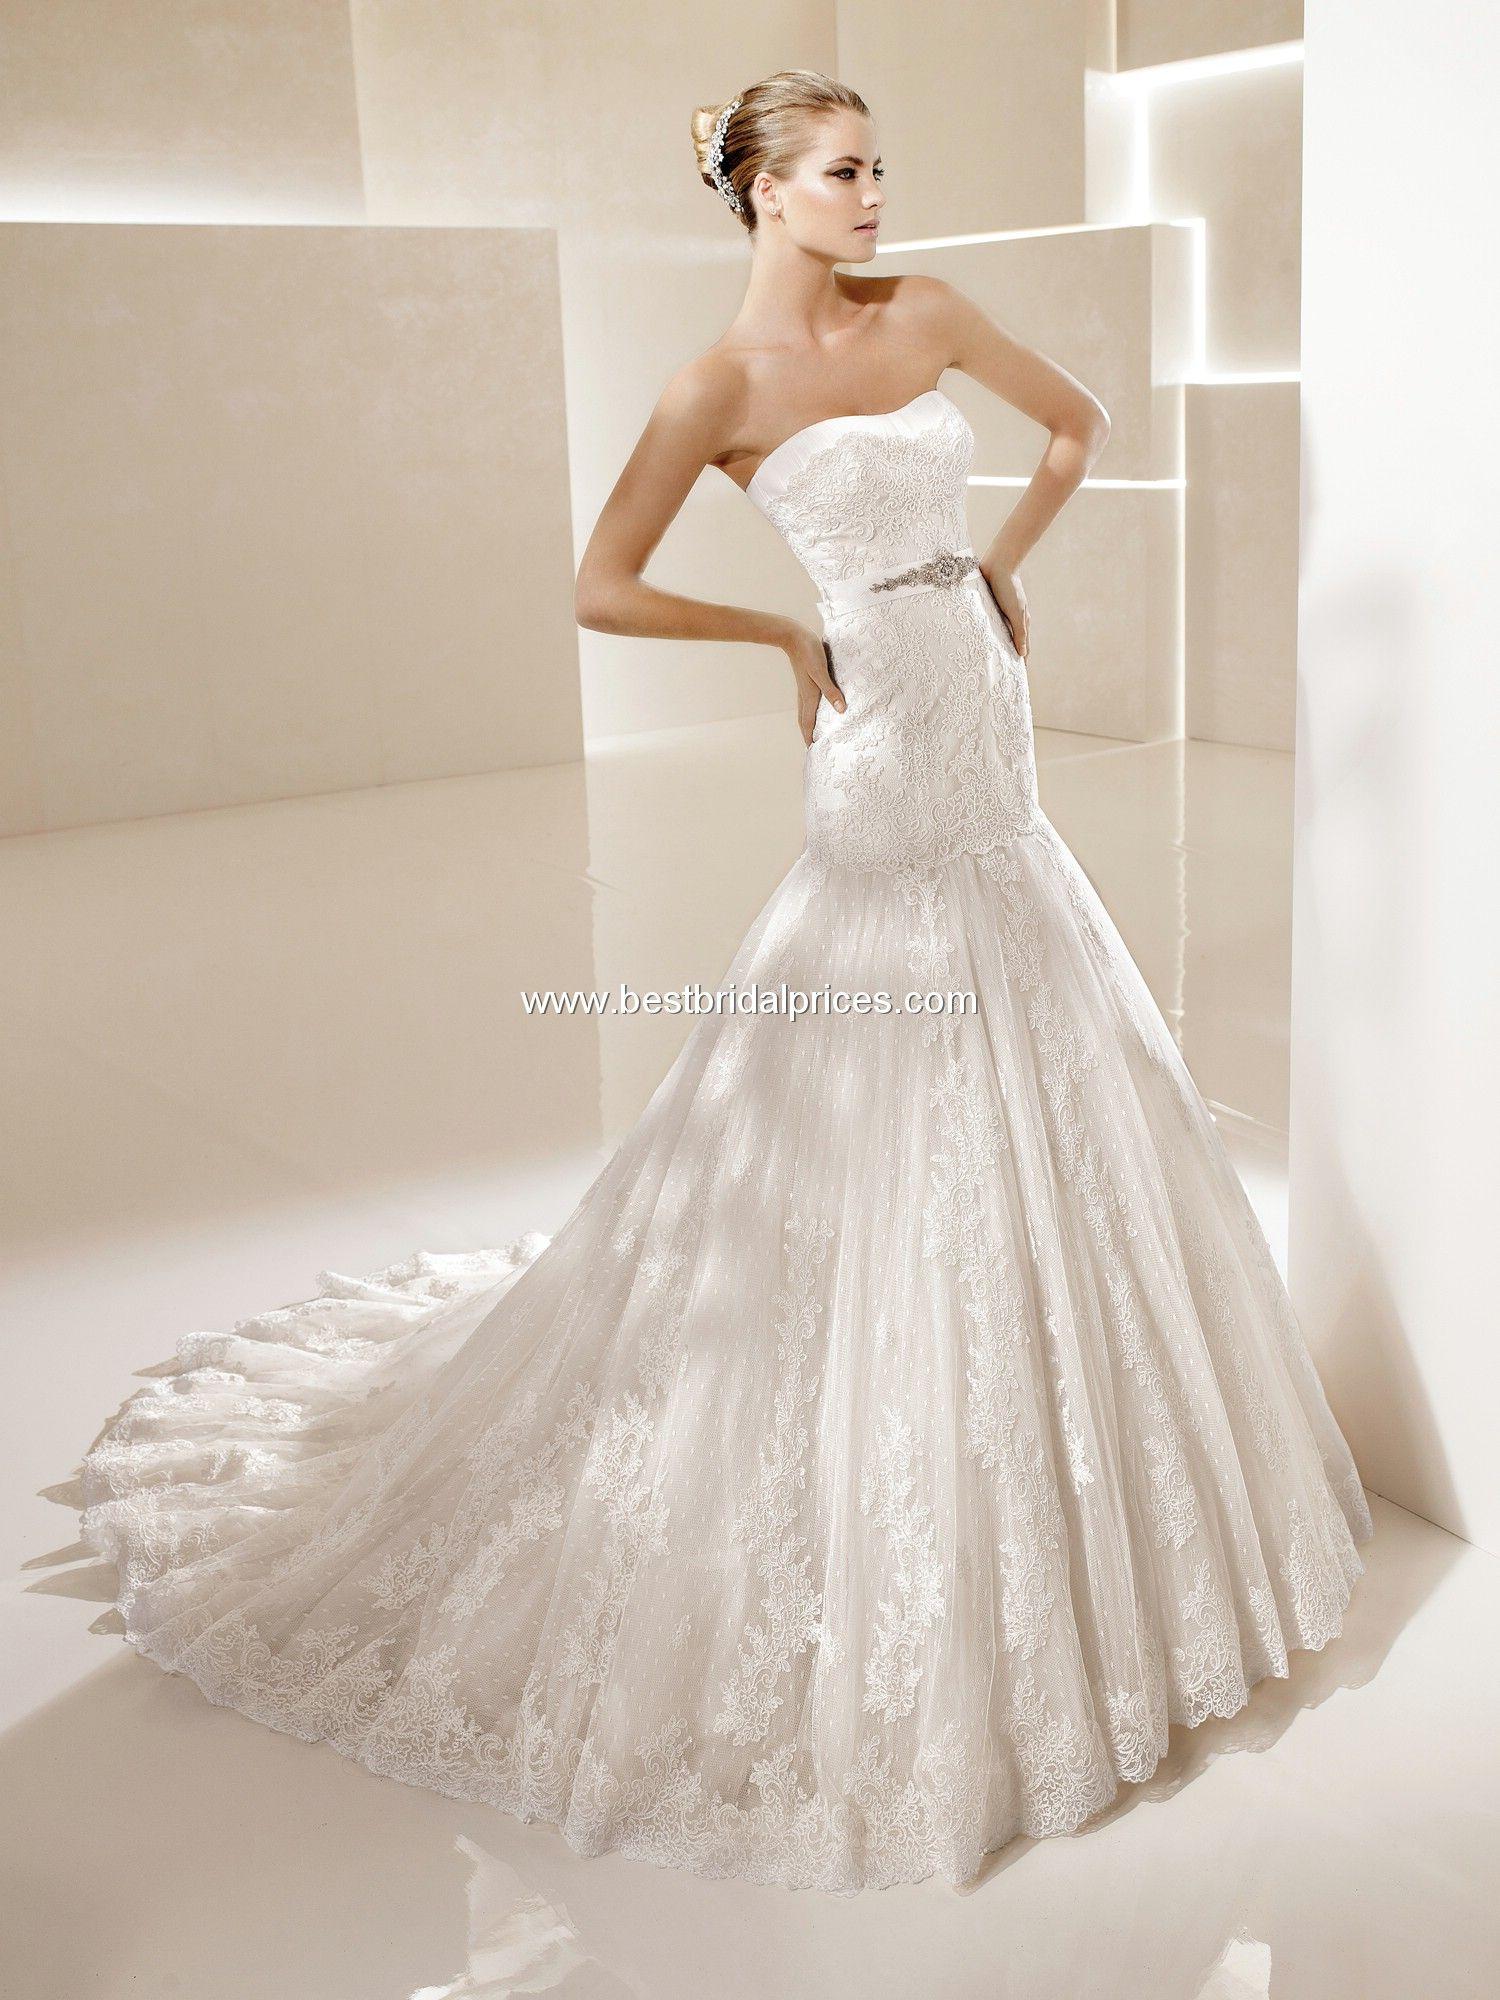 Girls wedding dress  La Sposa Wedding Dresses  Style Sena  Wedding Stuff  Pinterest